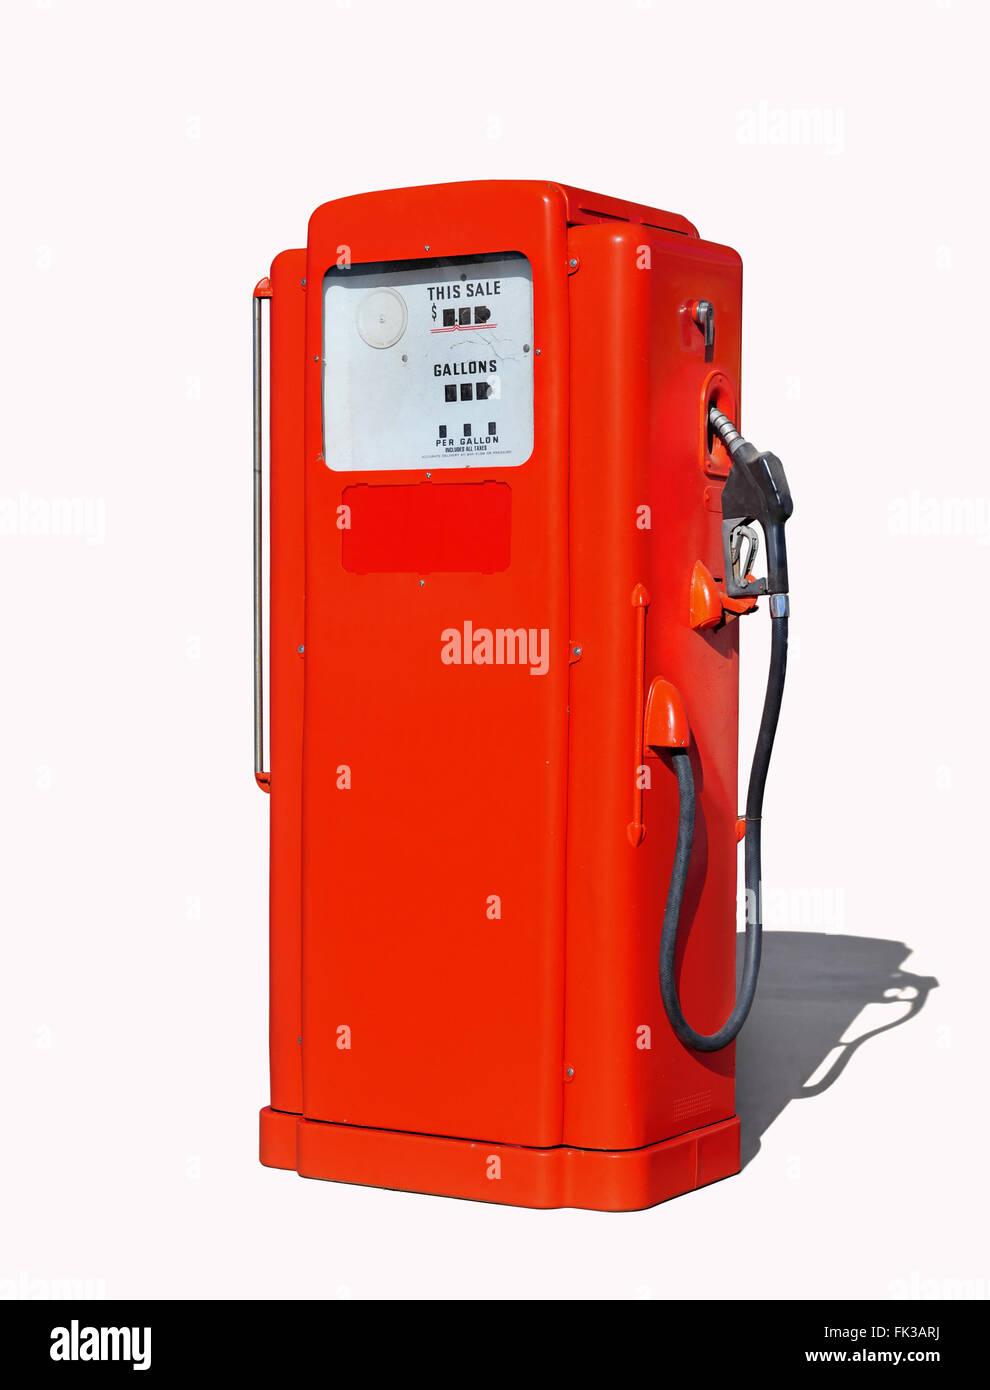 Vintage (retro) red gasoline pump - Stock Image